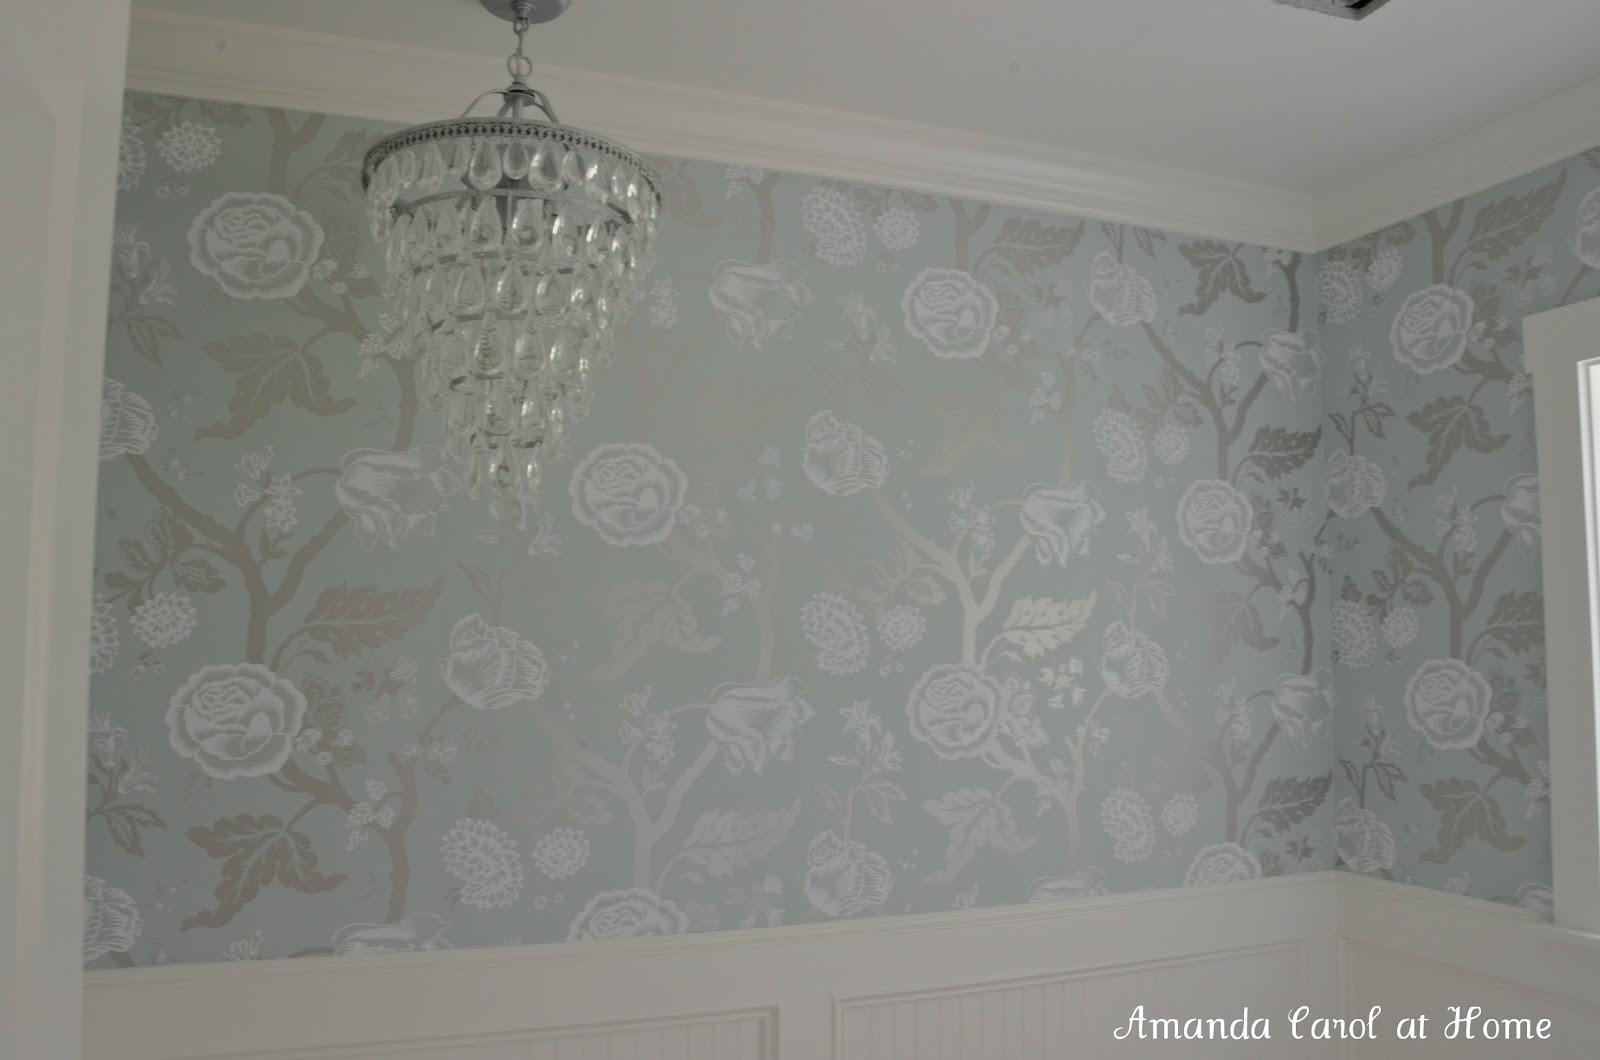 Hq Hd 2014 Wallpapers: Wallpaper: The Home Depot- Sea